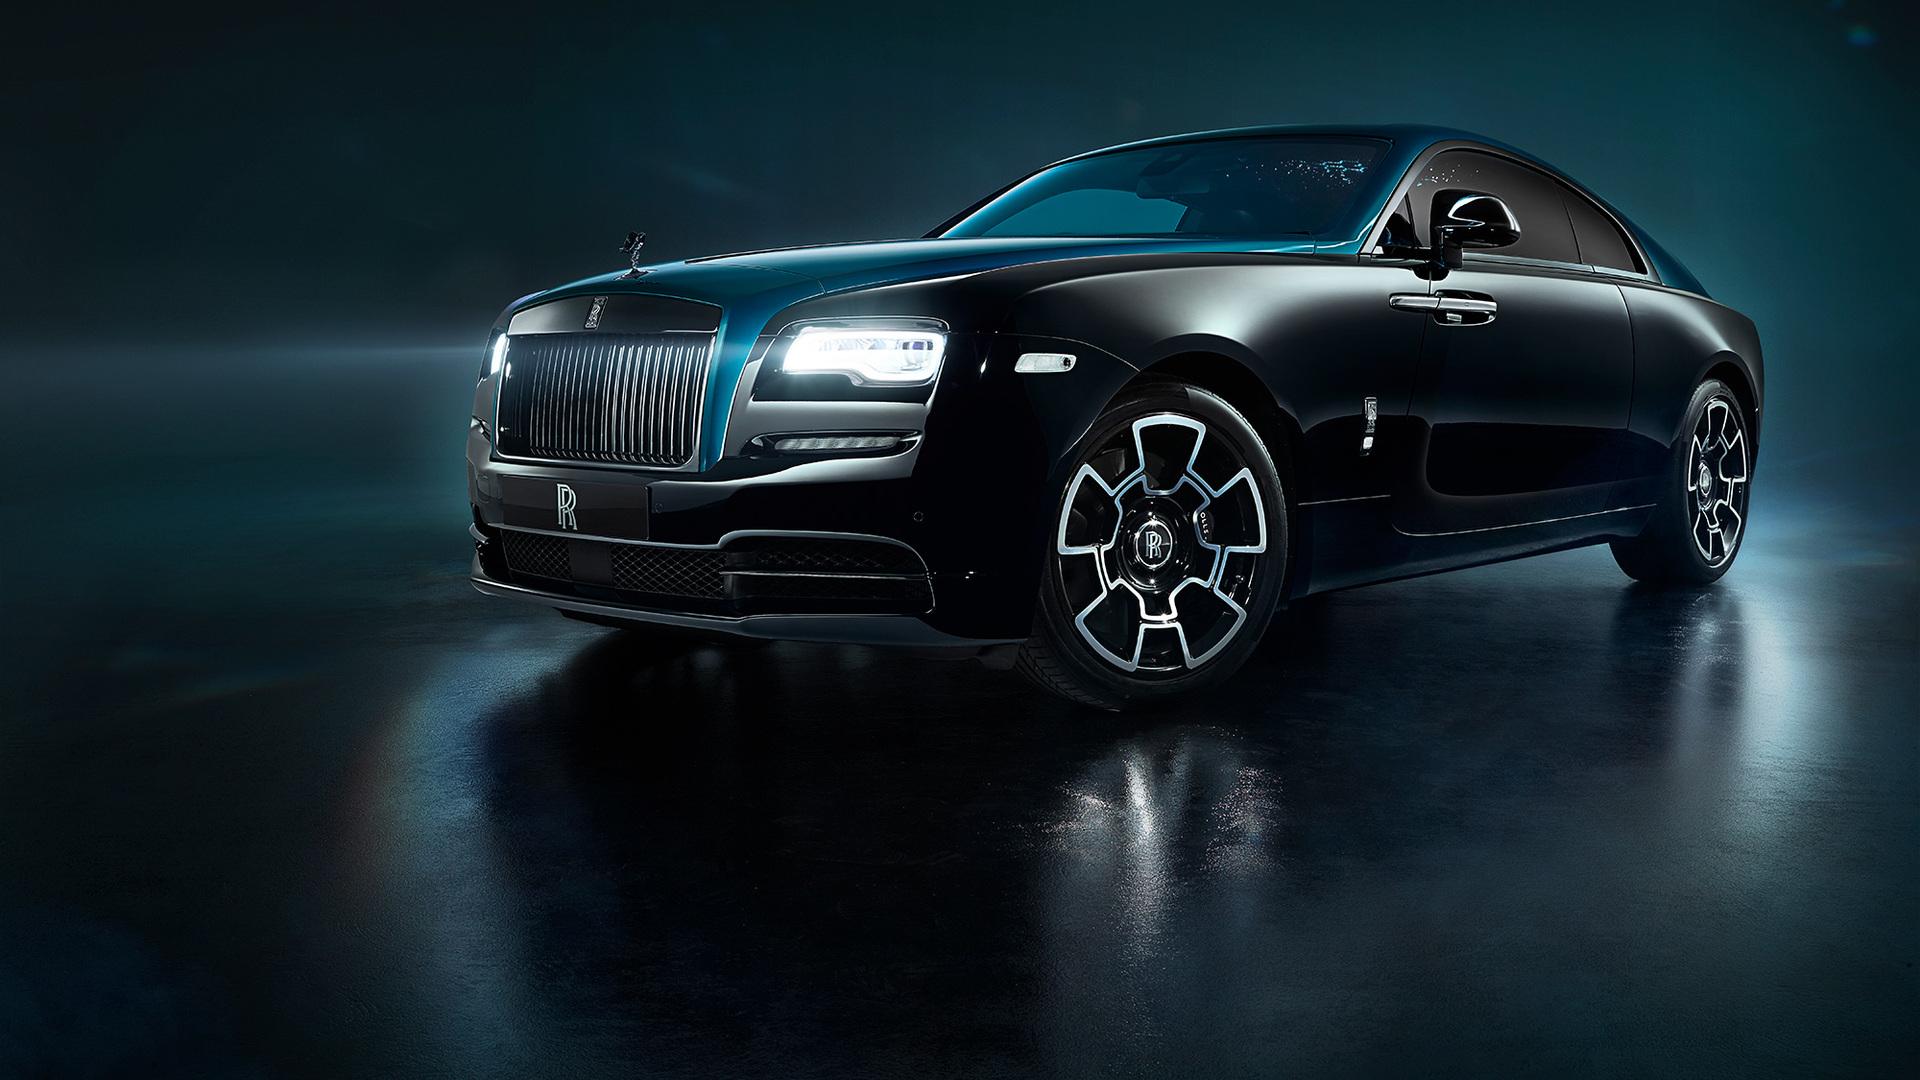 1920x1080 Rolls Royce Black Badge Dawn Front Laptop Full ...